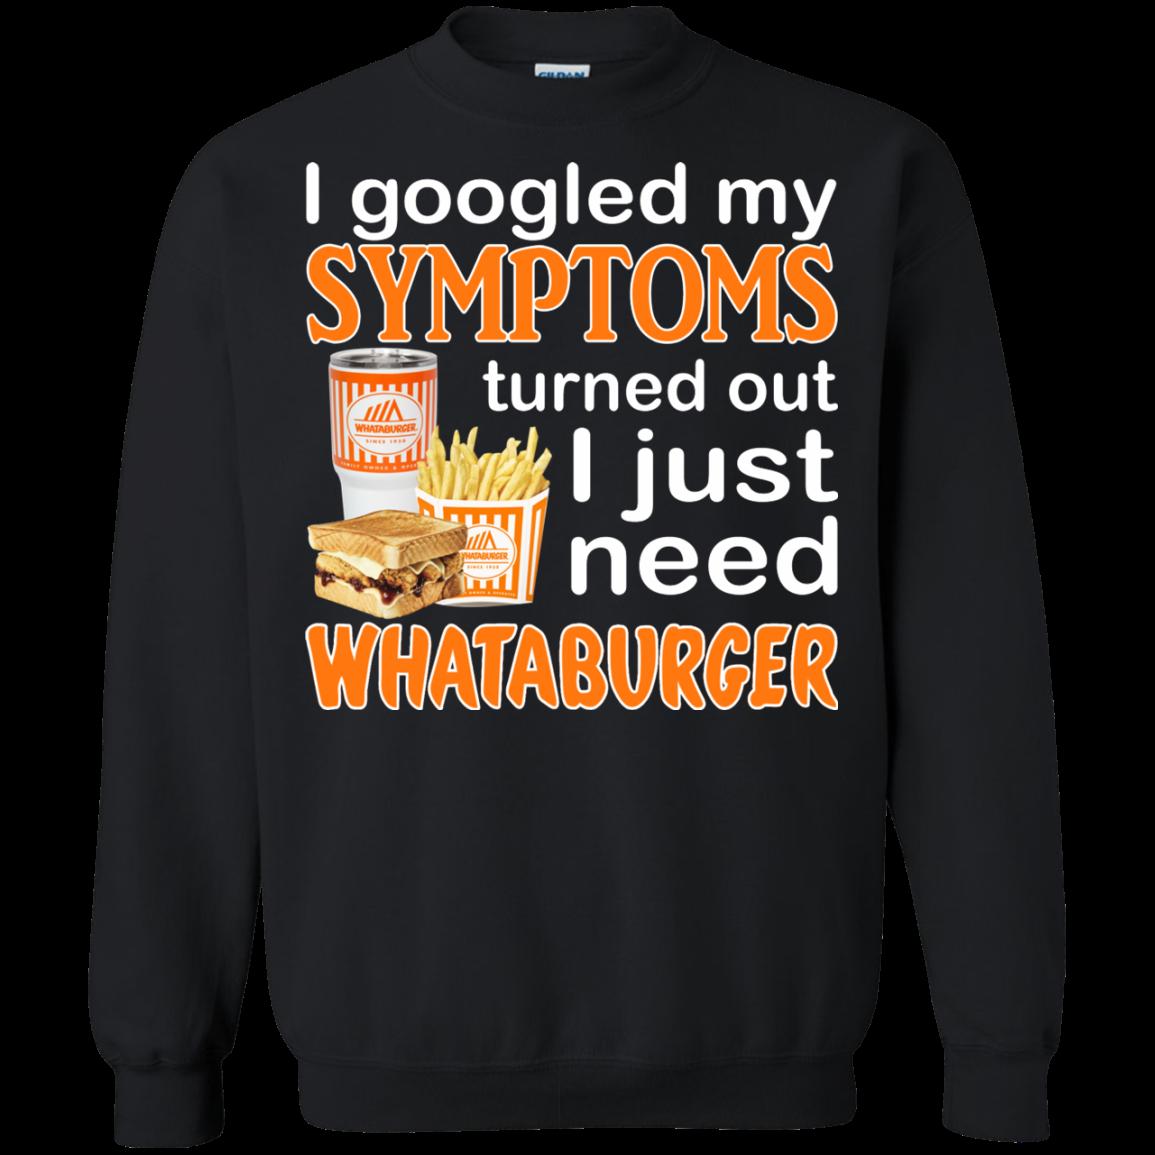 236e3e147faa7 I Googled My Symptoms Turned Out I Just Need Whataburger Shirt